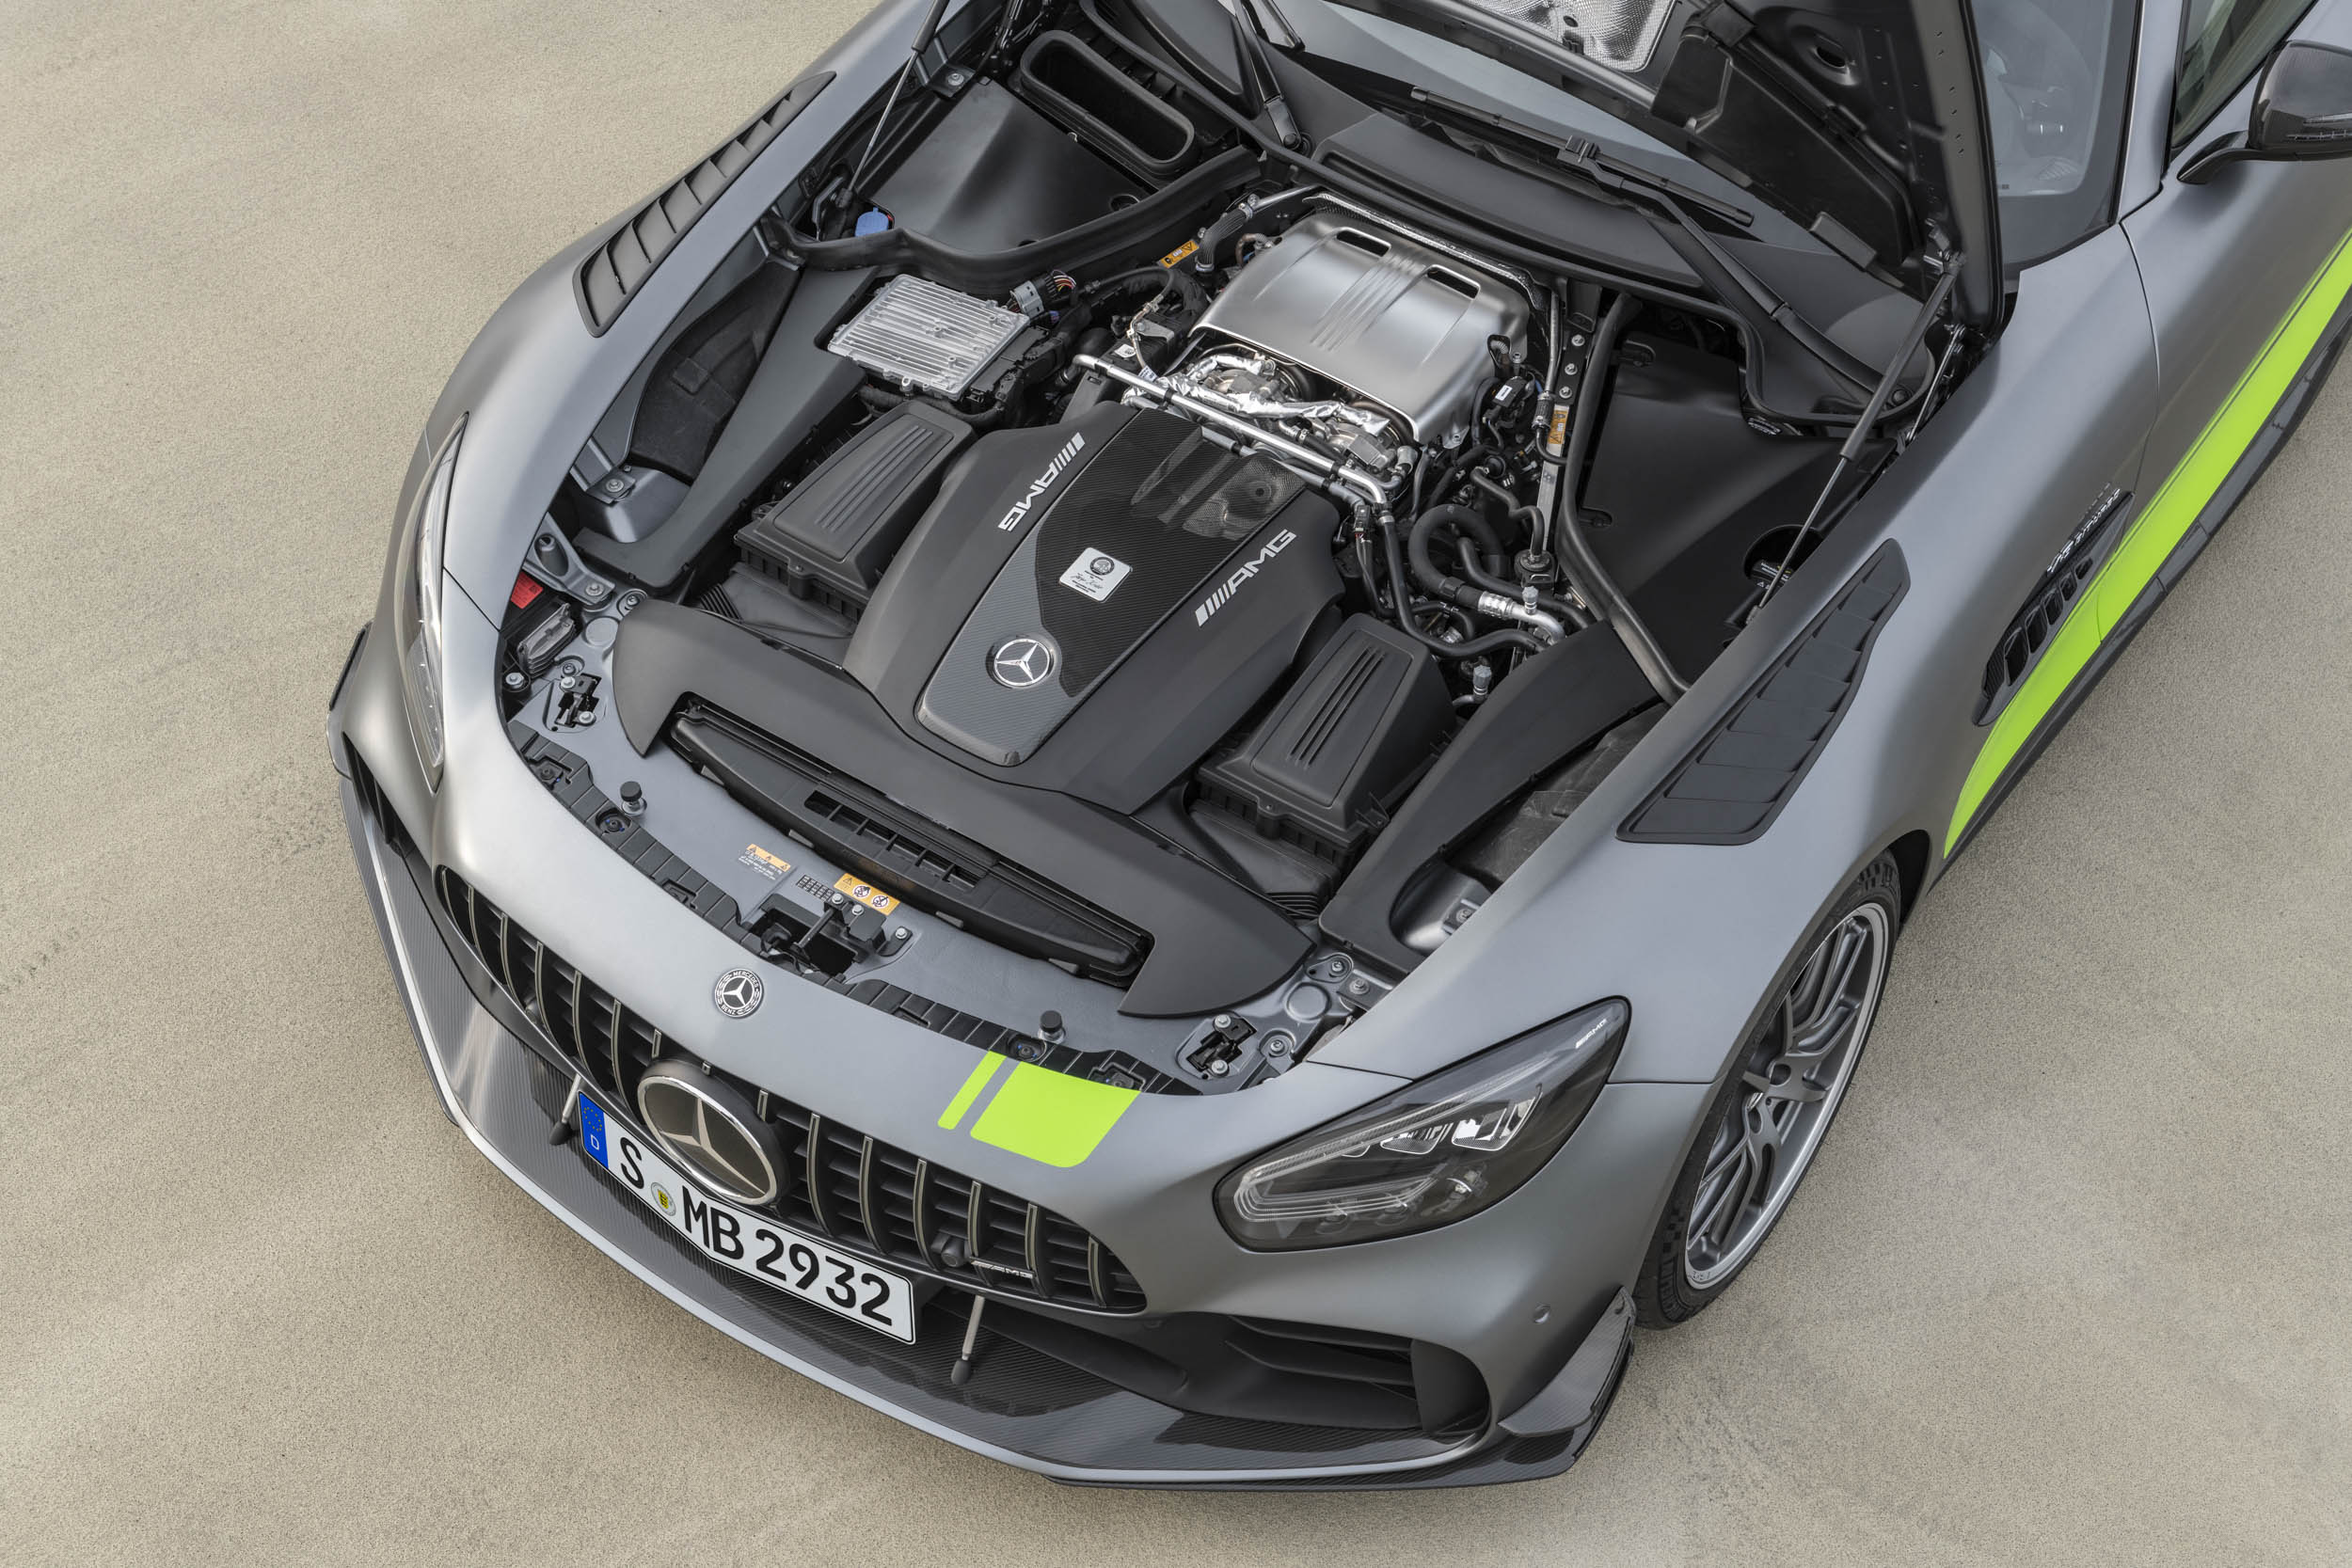 Mercedes-AMG GT R Pro engine